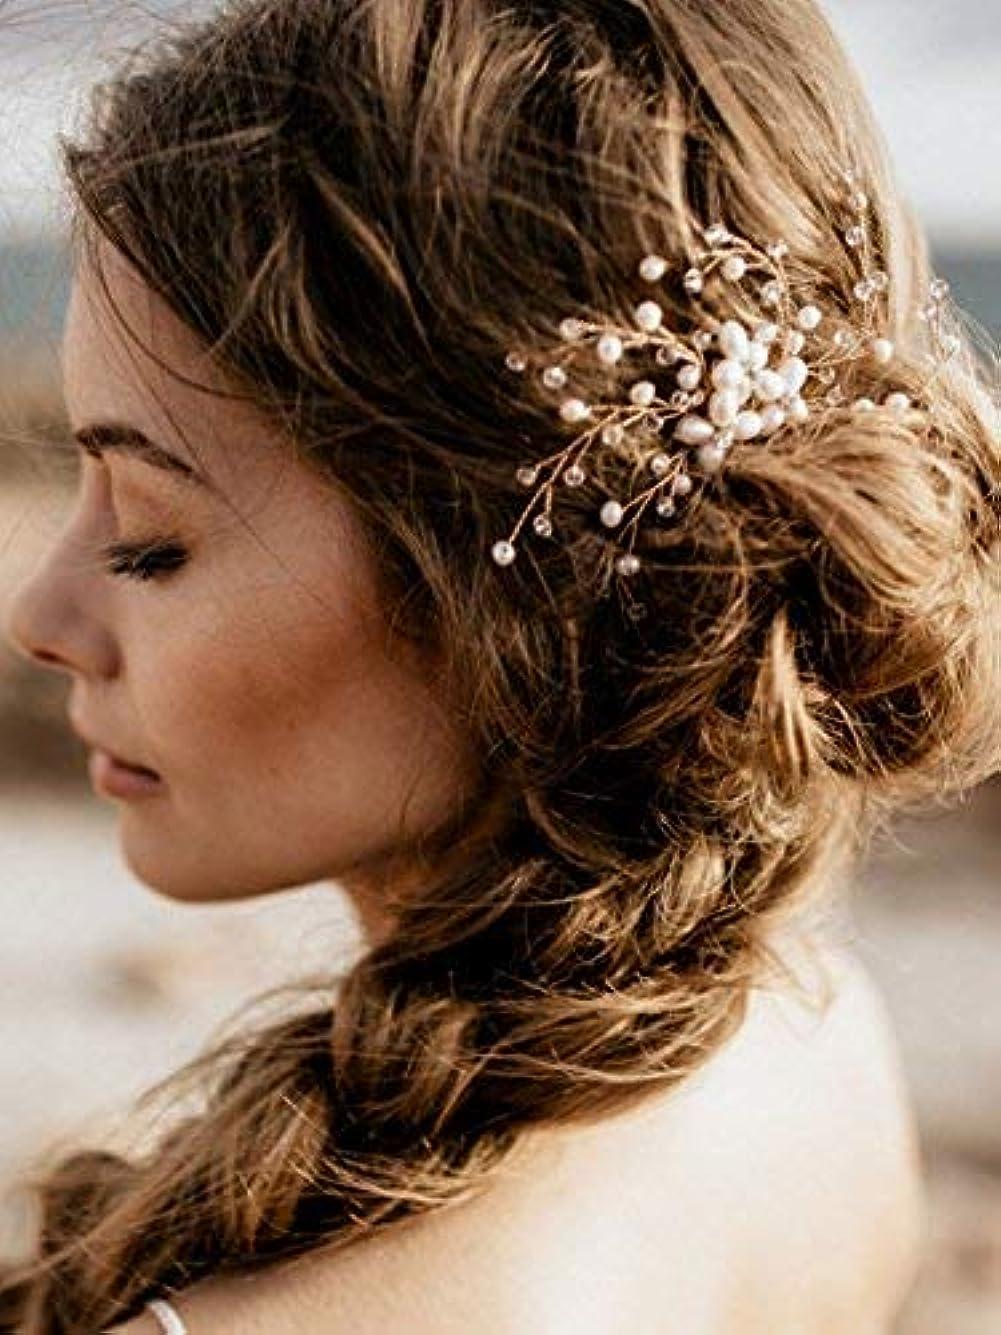 FXmimior Vintage Bridal Women Vintage Wedding Party Hair Comb Crystal Vine Hair Accessories [並行輸入品]